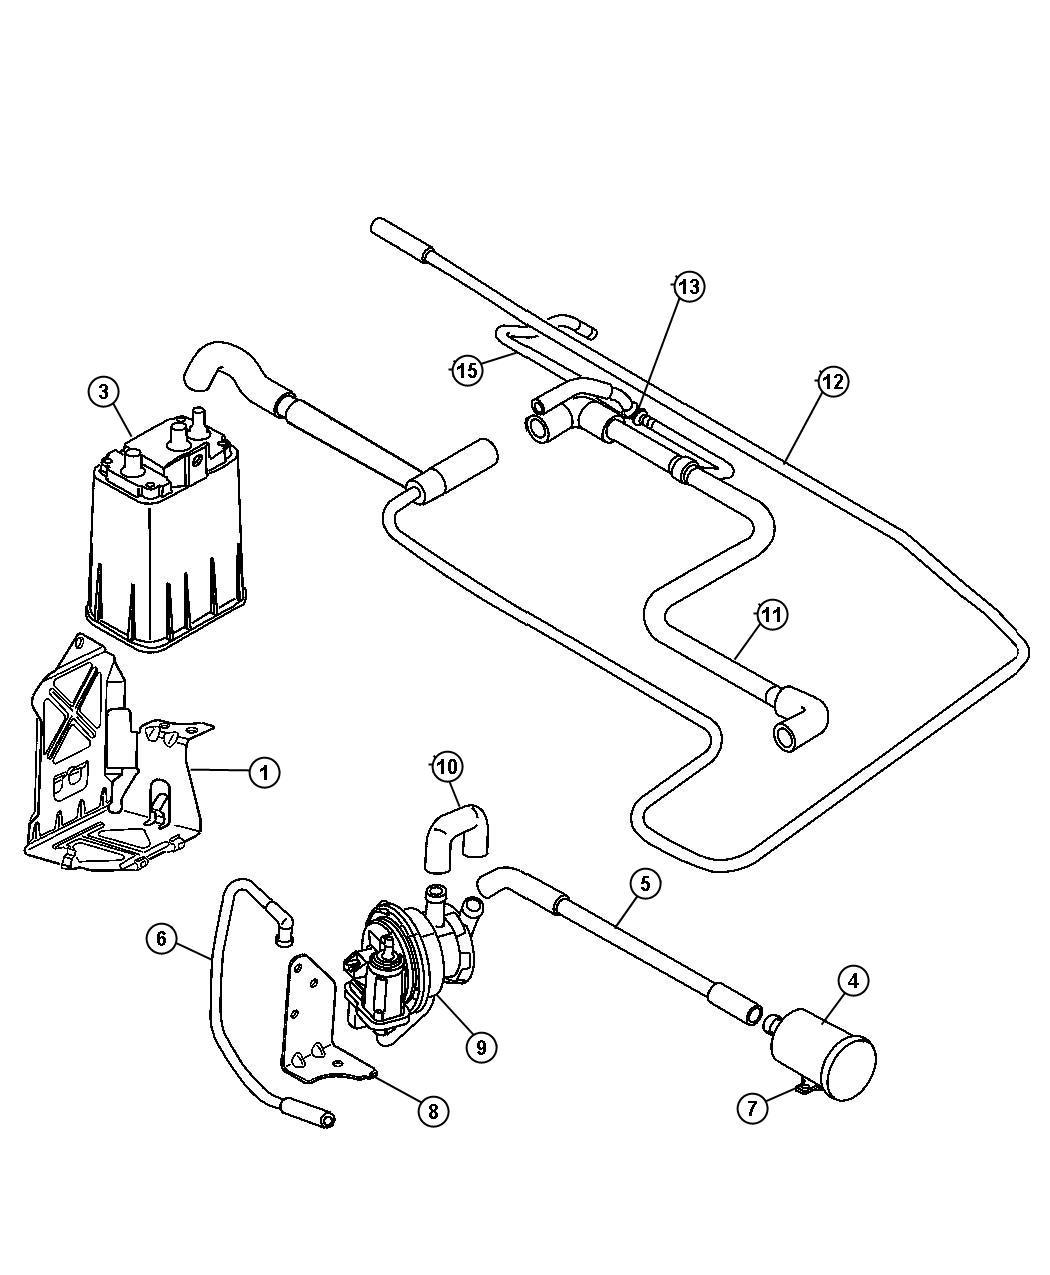 Dodge Ram Filter Fuel Vapor Vent Leak Detection